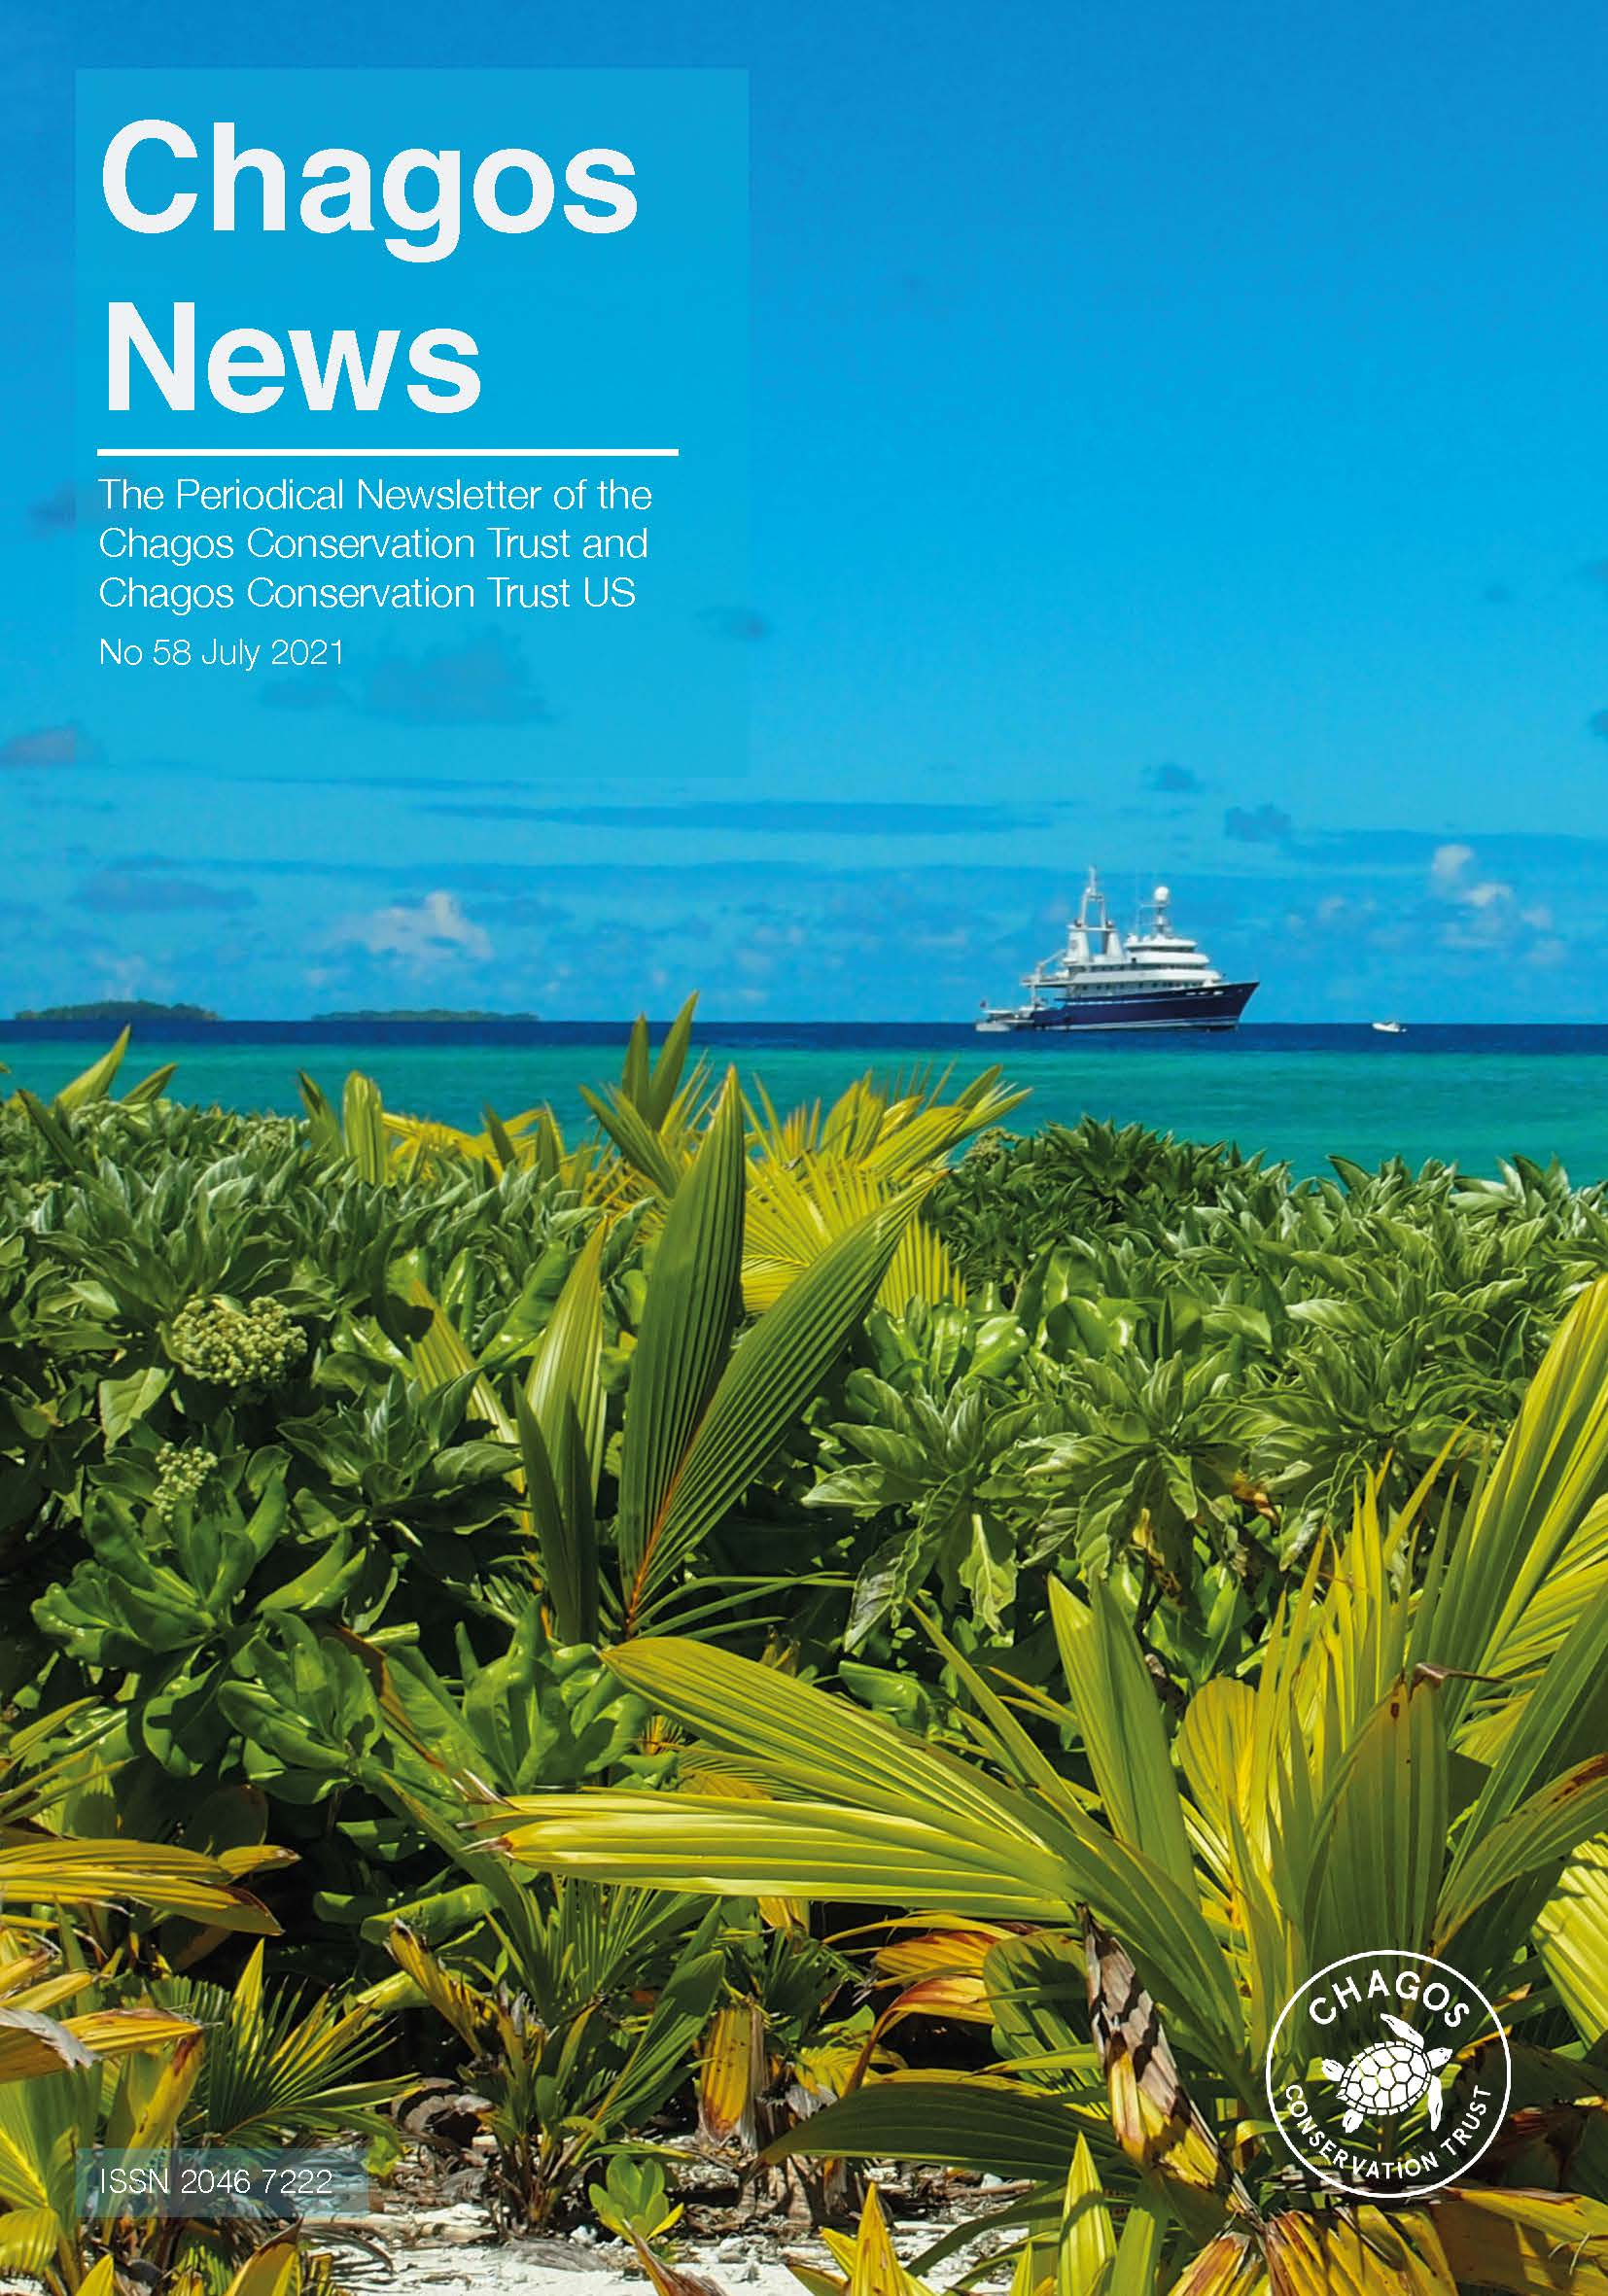 Chagos News issue #58